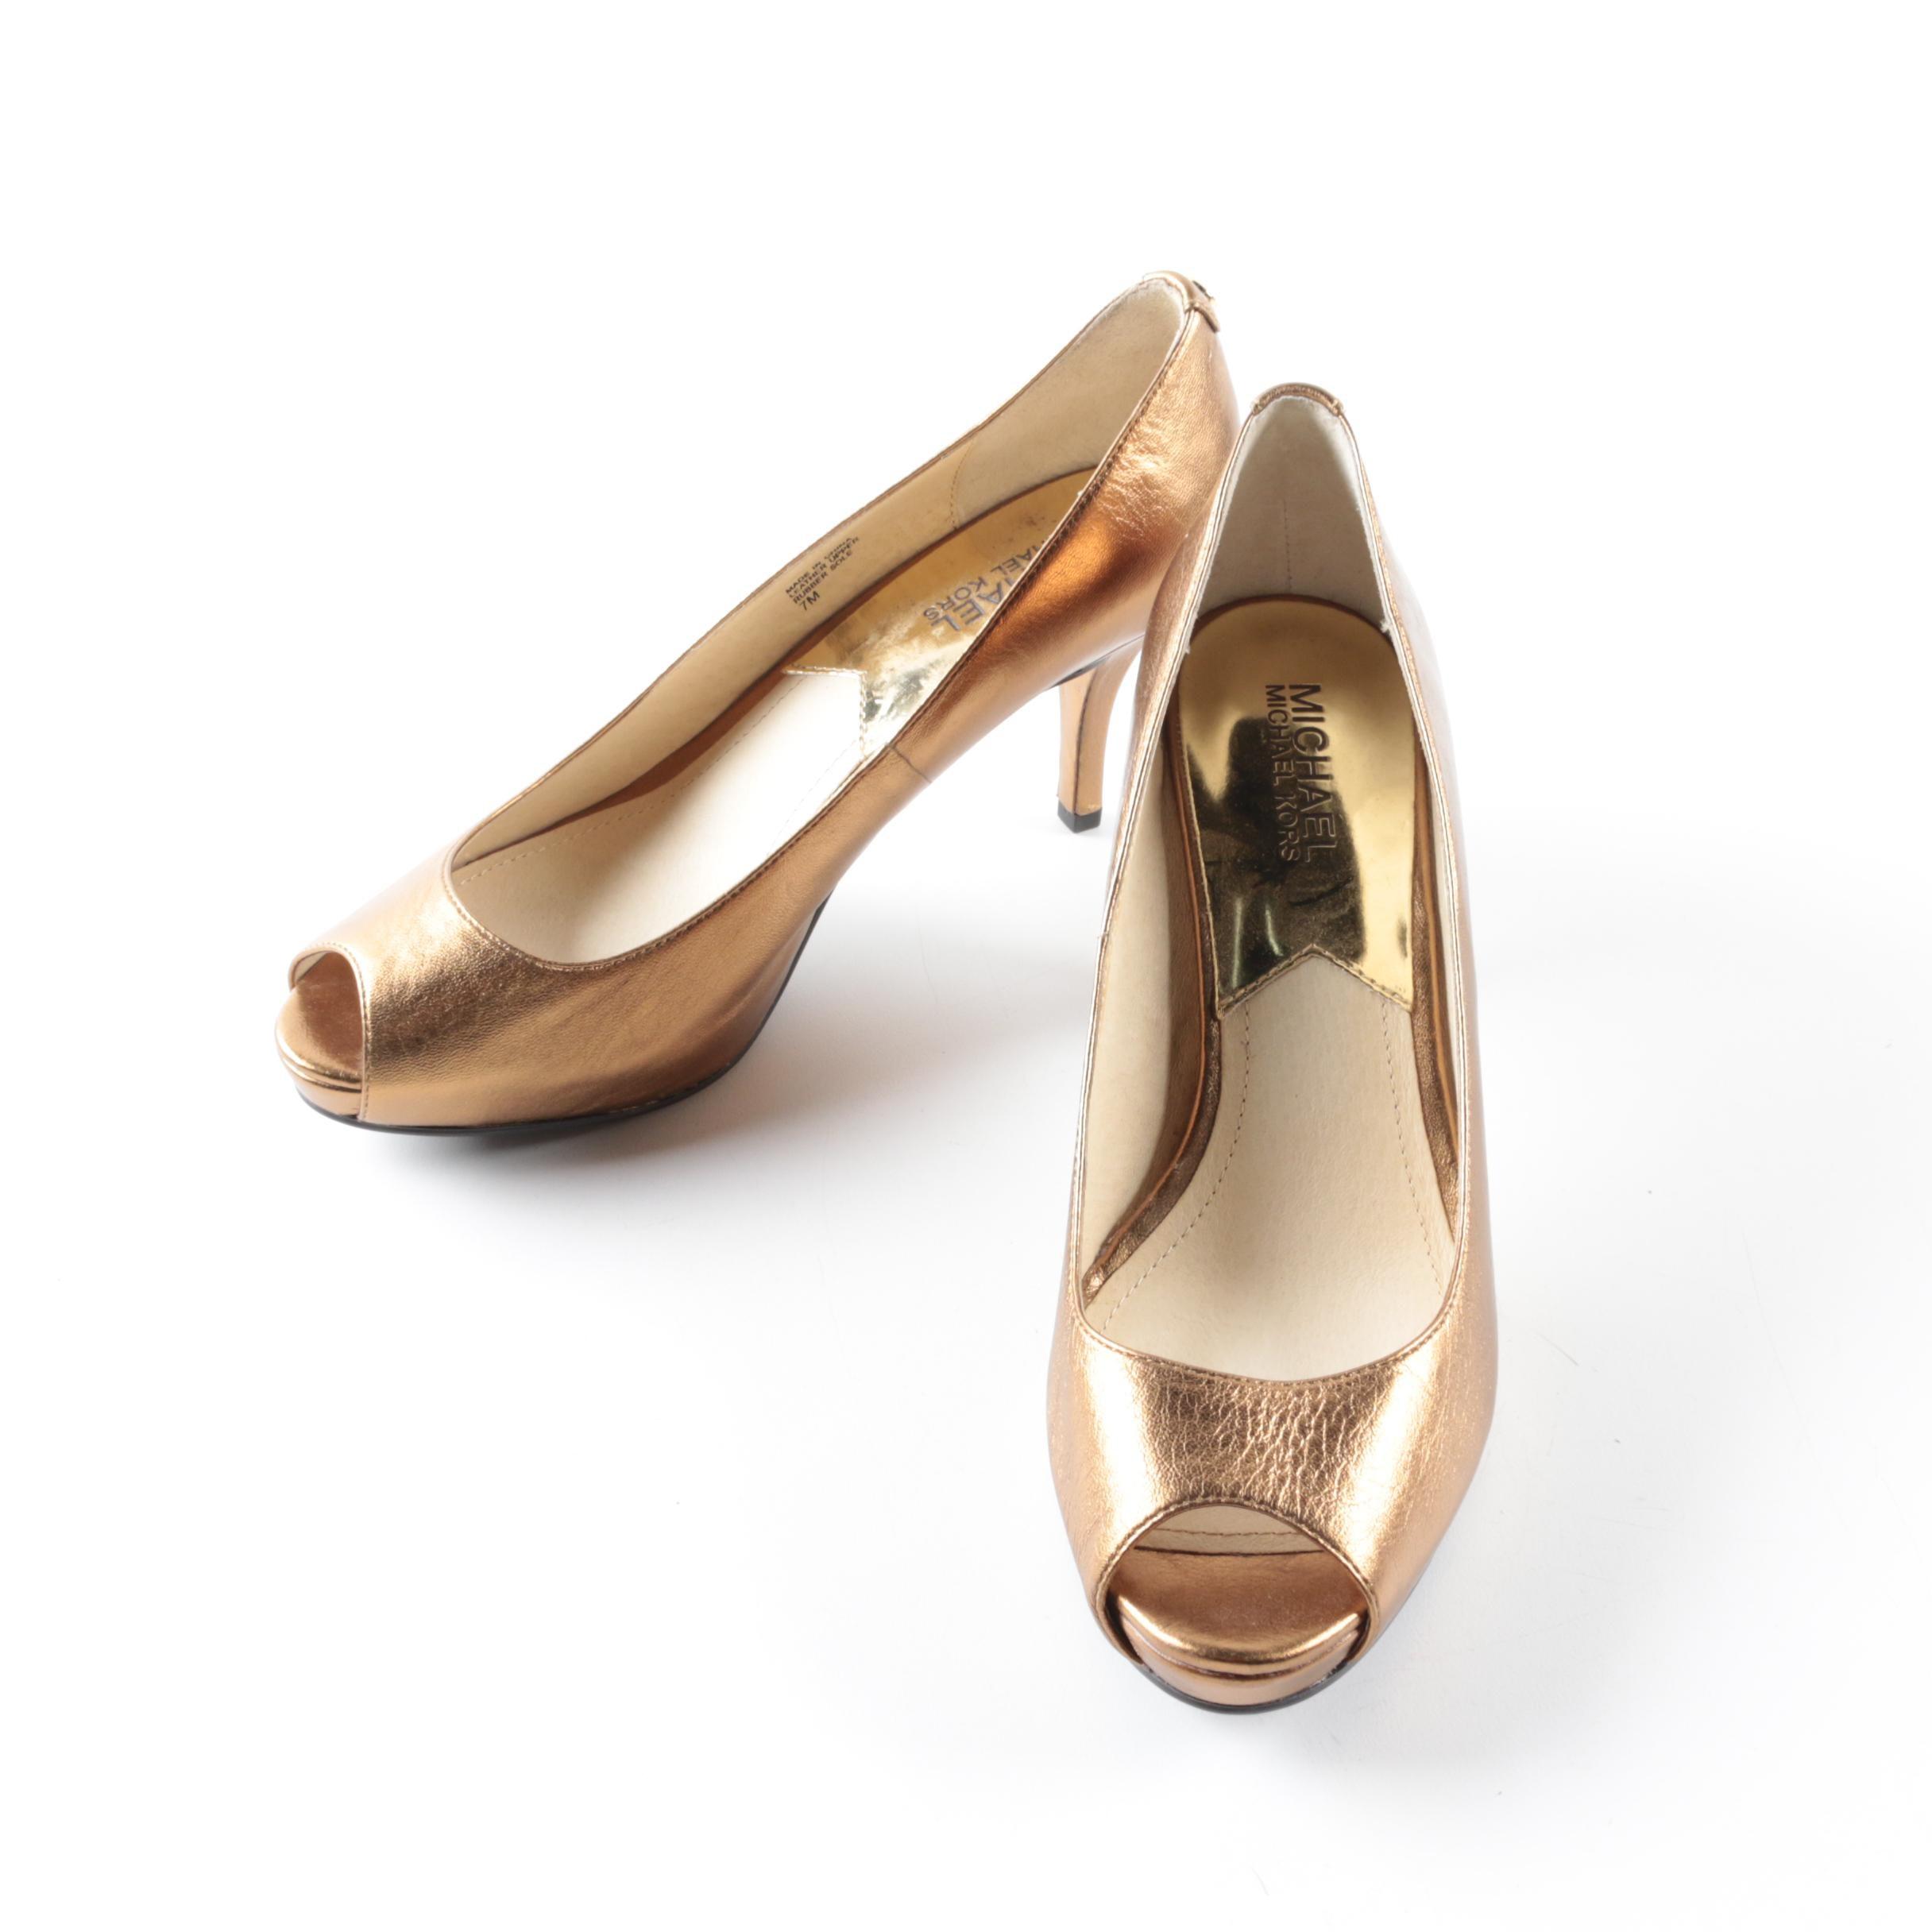 MICHAEL Michael Kors Copper Tone Leather Peep-Toe Pumps